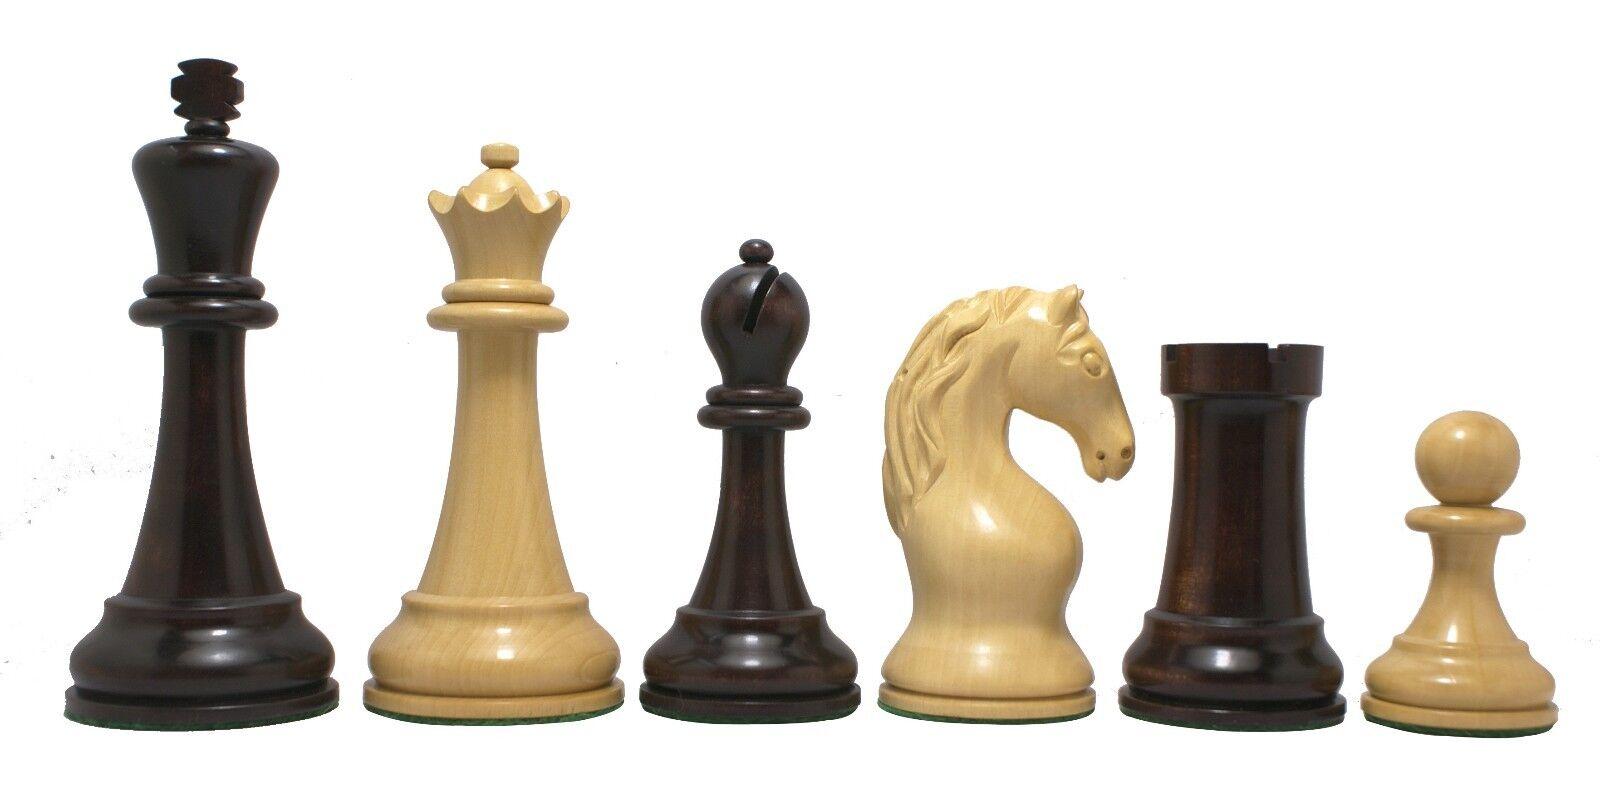 Piatigorsky Cup 1862-1865 Replica 4.5   Chess SETR Box bois & de couleur acajou  achats de mode en ligne